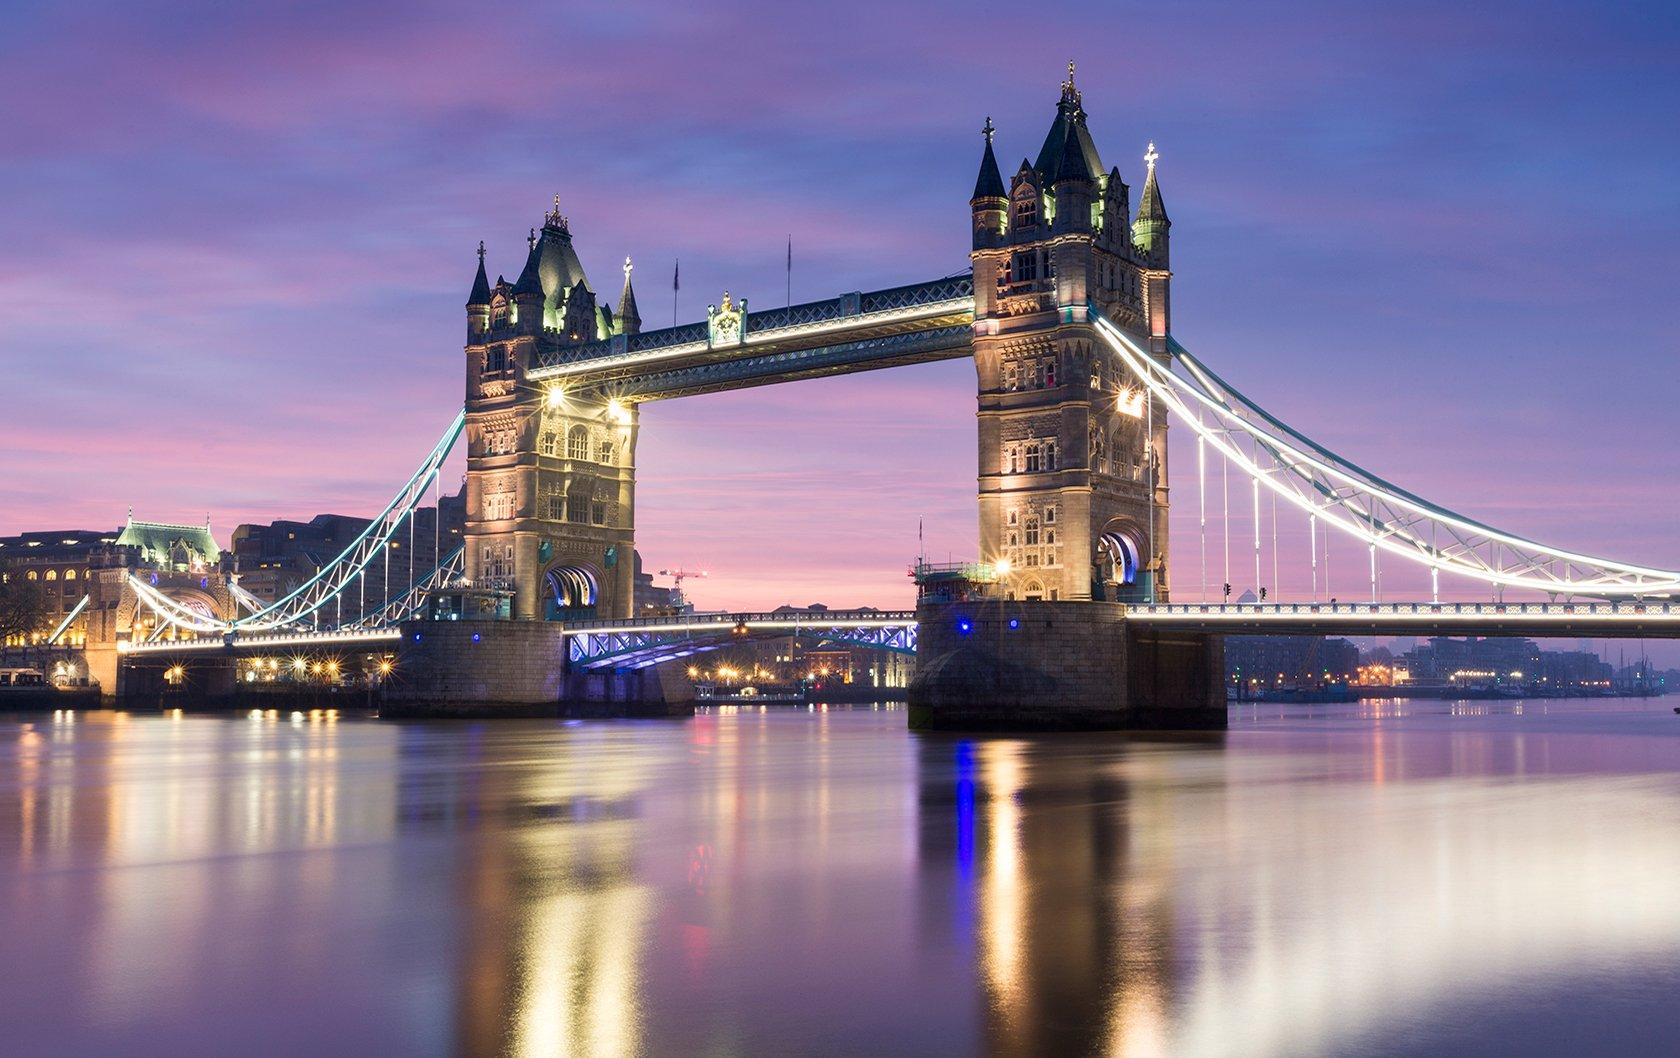 Tower Bridge in evening light